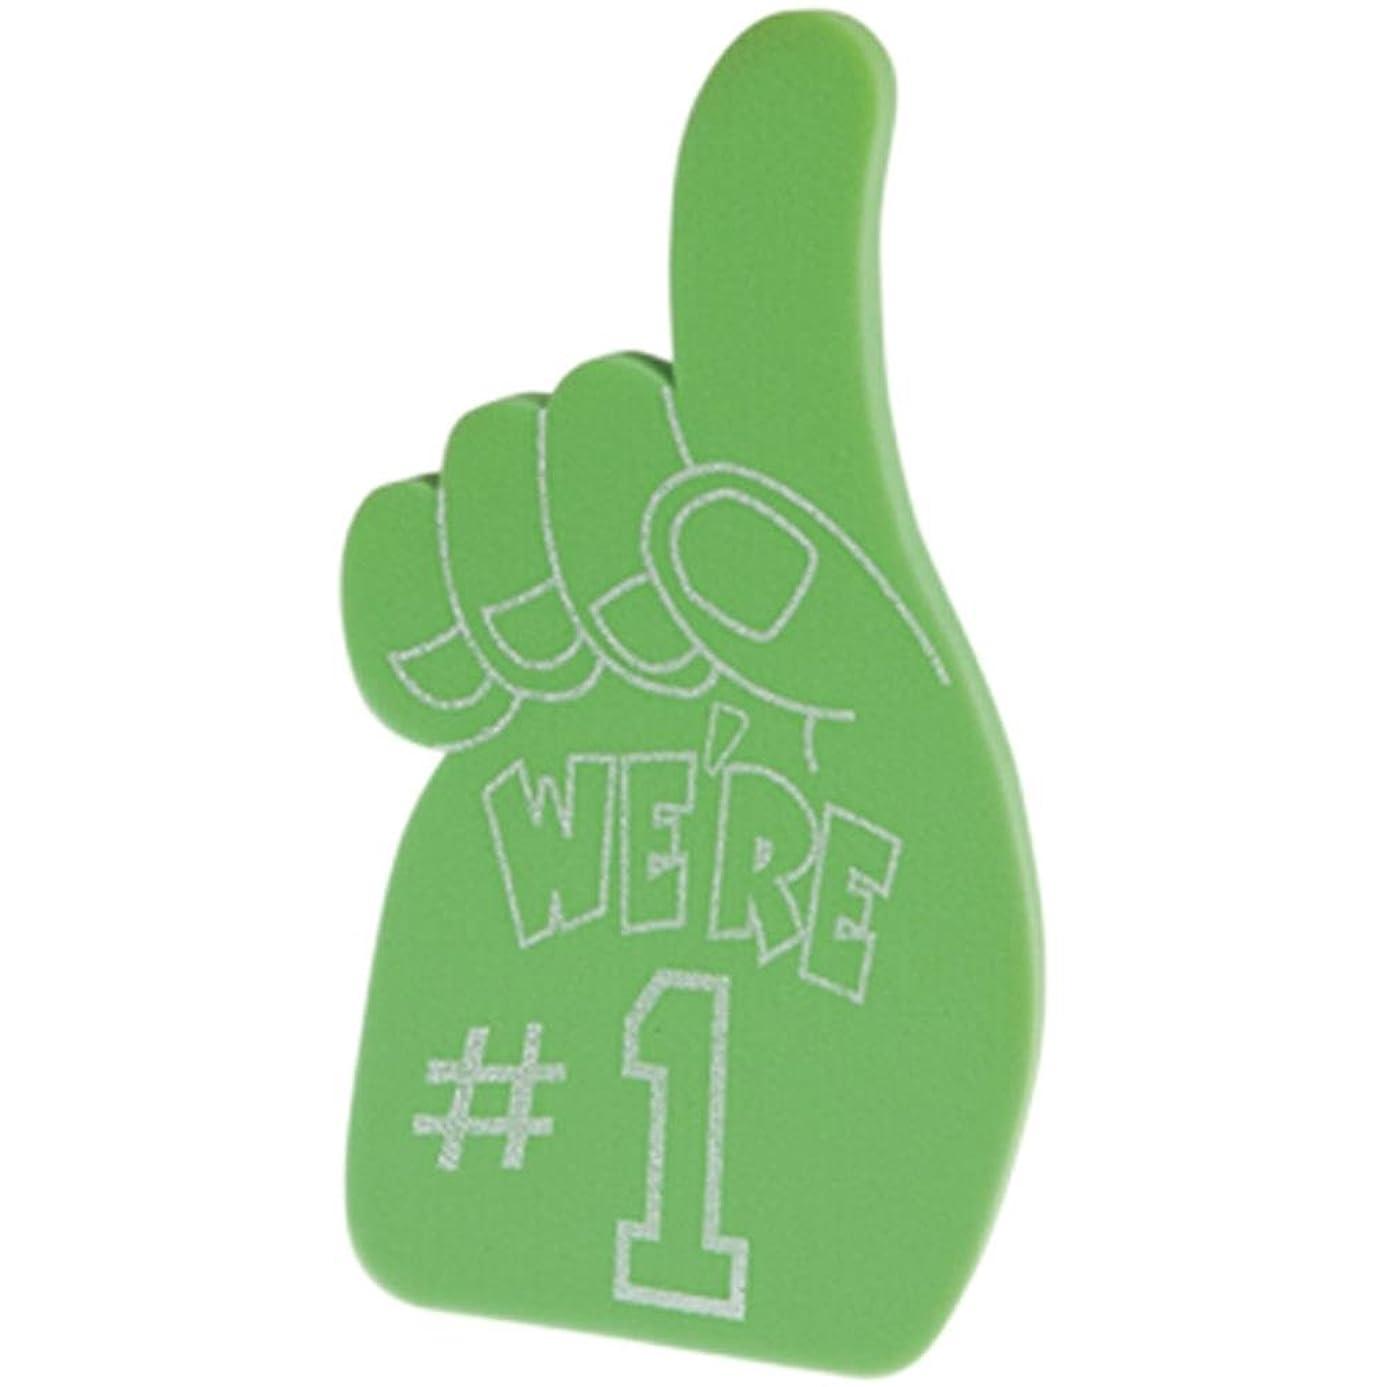 U.S. Toy KD24-10 Foam Number 1 Hands, Green